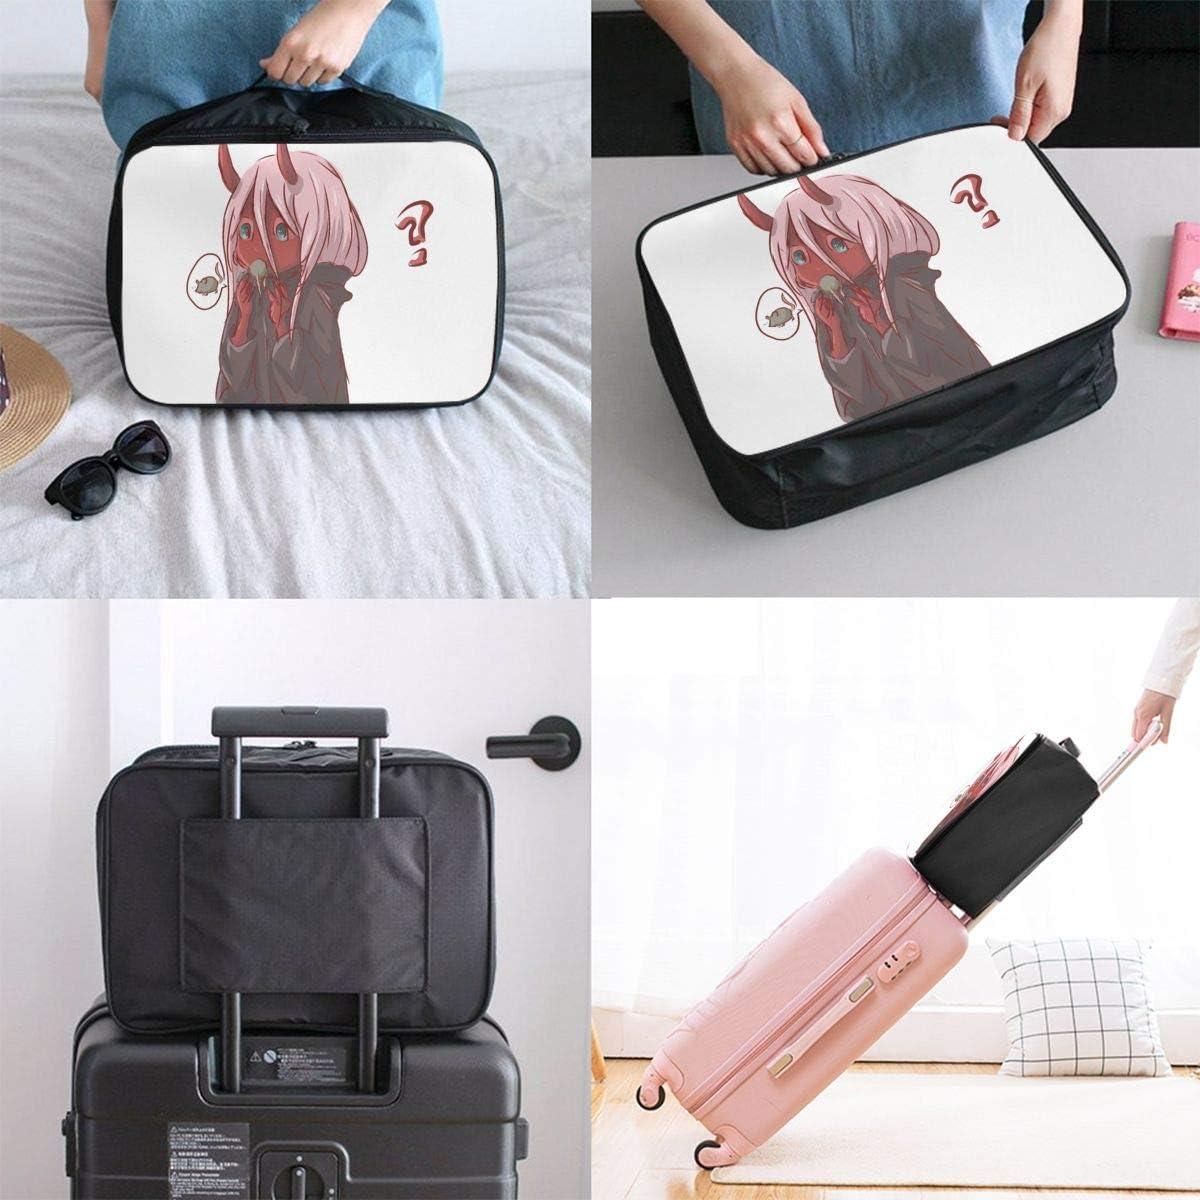 Darling In The Franxx XX Lightweight Large Capacity Portable Luggage Bag Hanging Organizer Bag Makeup Bag